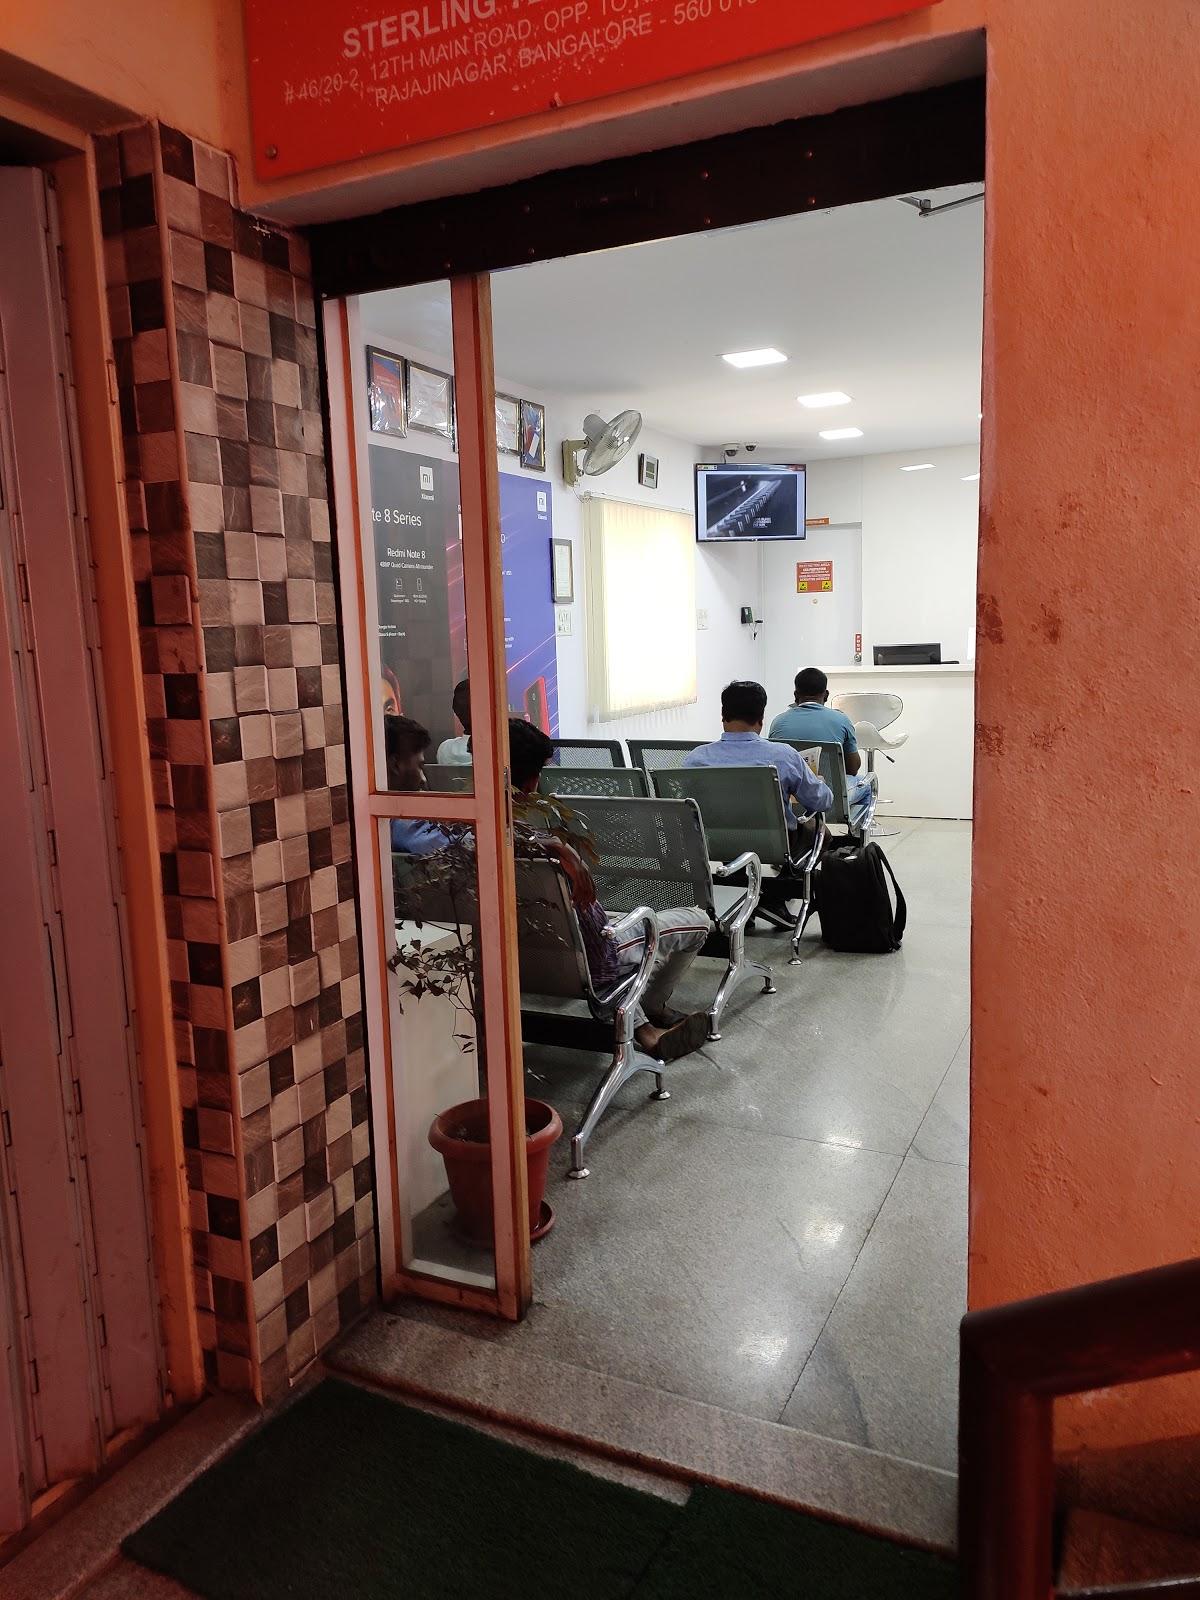 Opp Navrang Theater Rajajinagar (MI Exclusive Service Center)